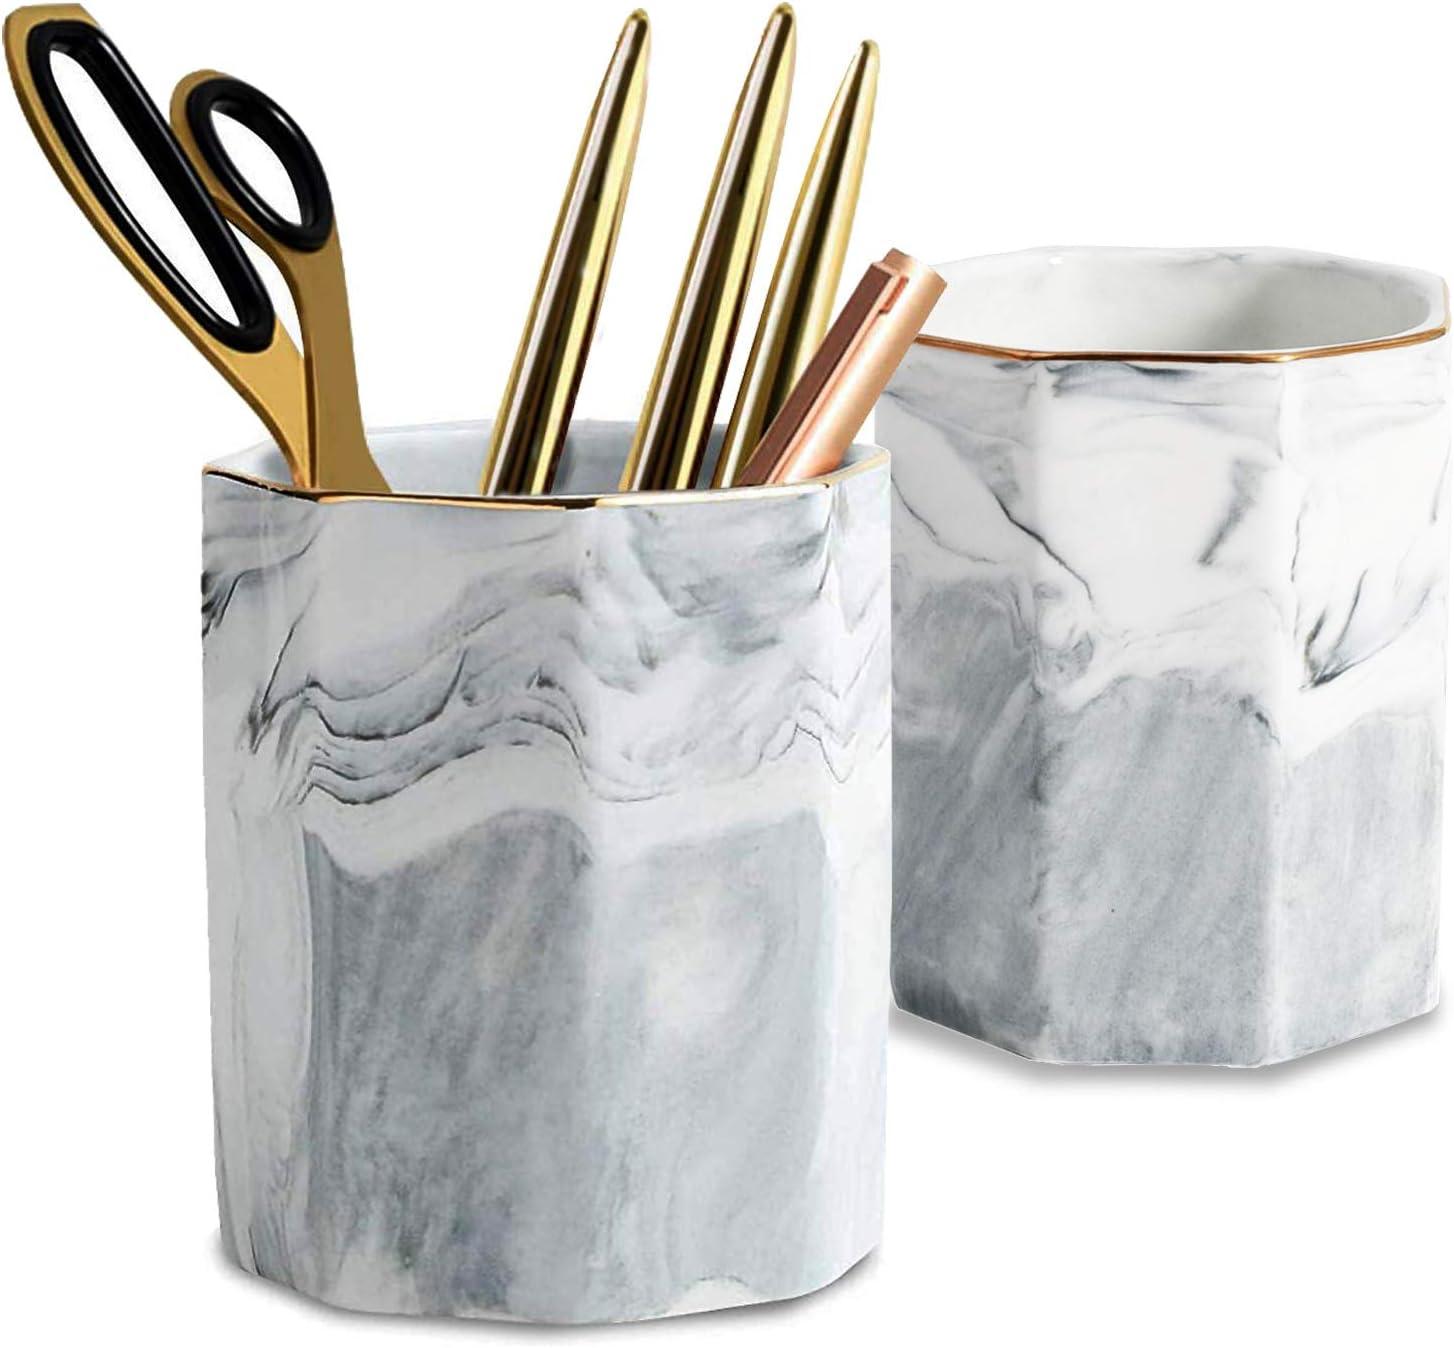 2 Pack Ceramic Pen Holder Stand,Cup for Desk Marble Pattern Makeup Brush Holder for Girls Women,Desk Accessories Holder,Durable Desktop Organizer Pencil Holder Pot Ideal Gift for Office Home (Gray)